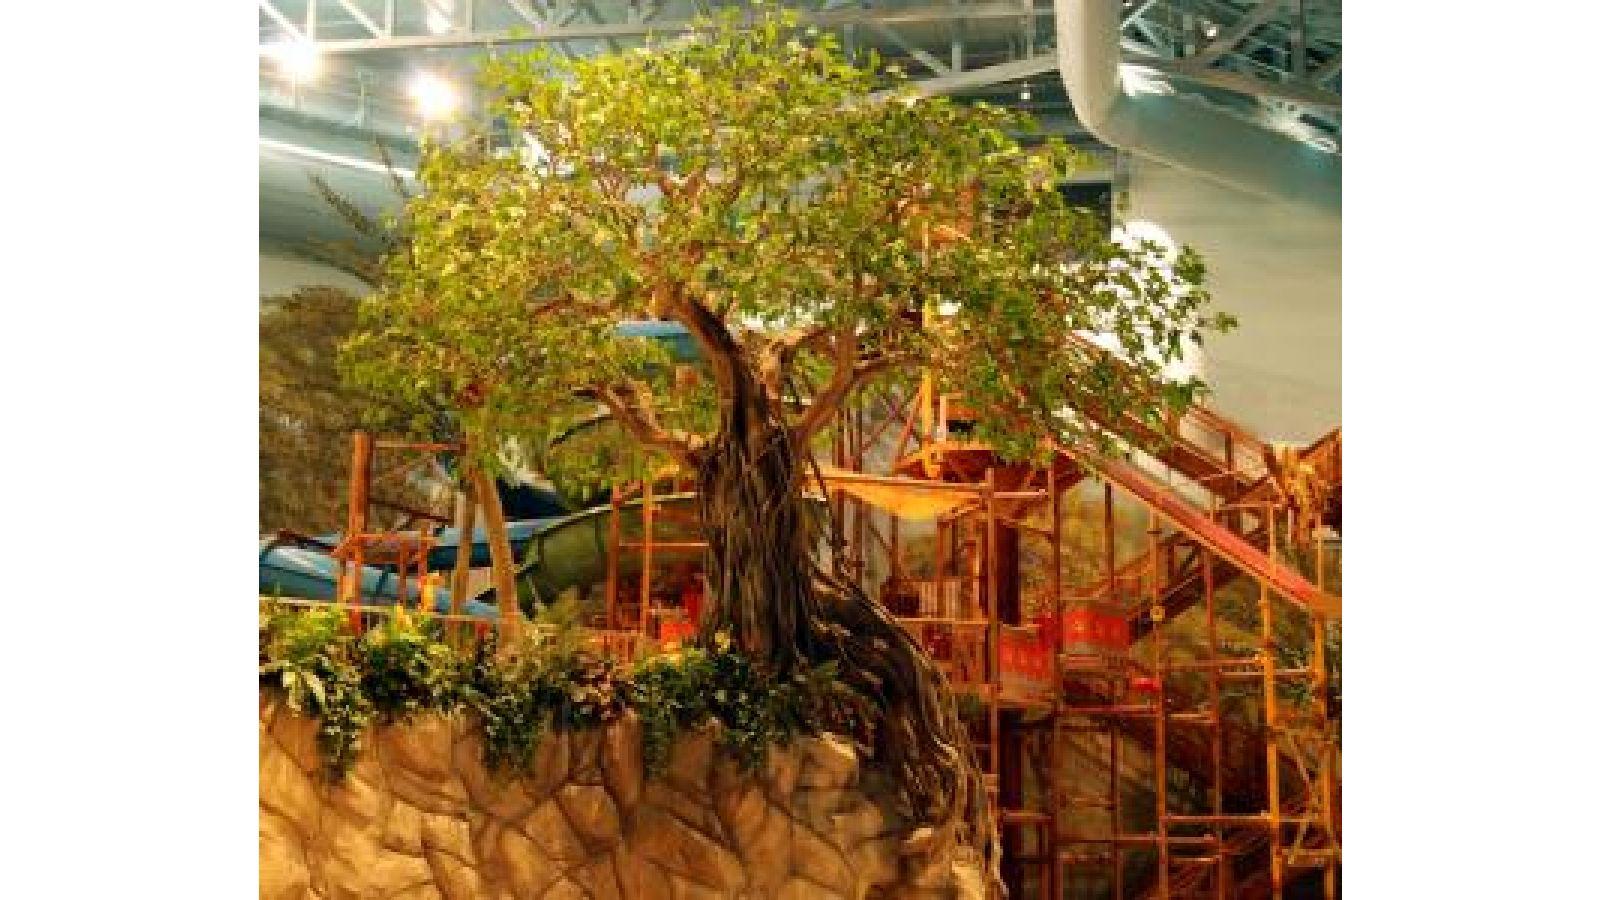 Banyan Tree - Aquatic Center